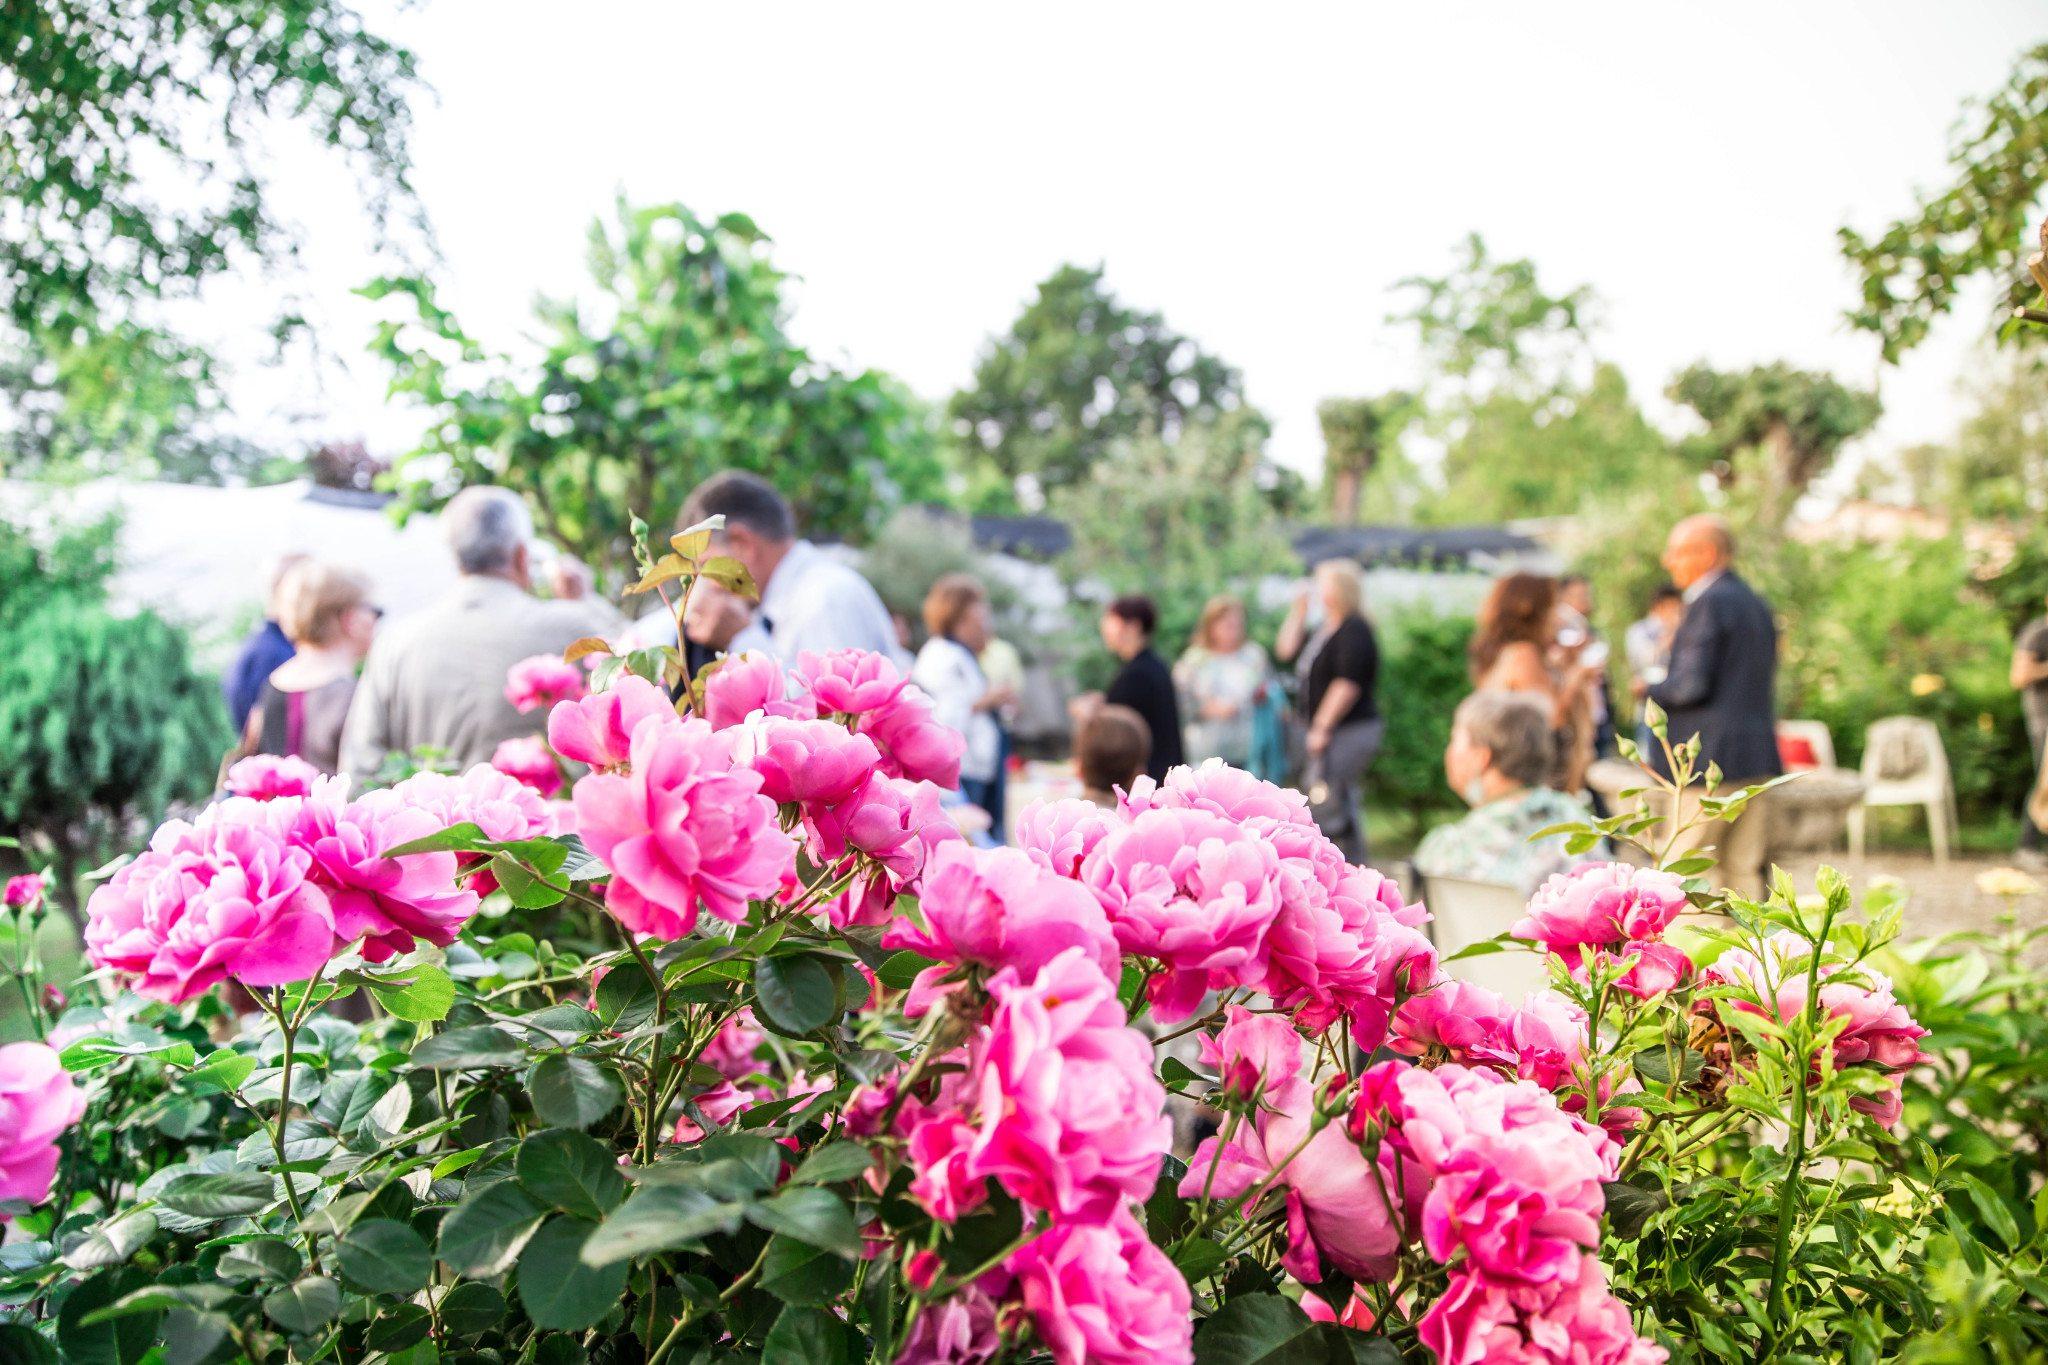 giardino_officinale56